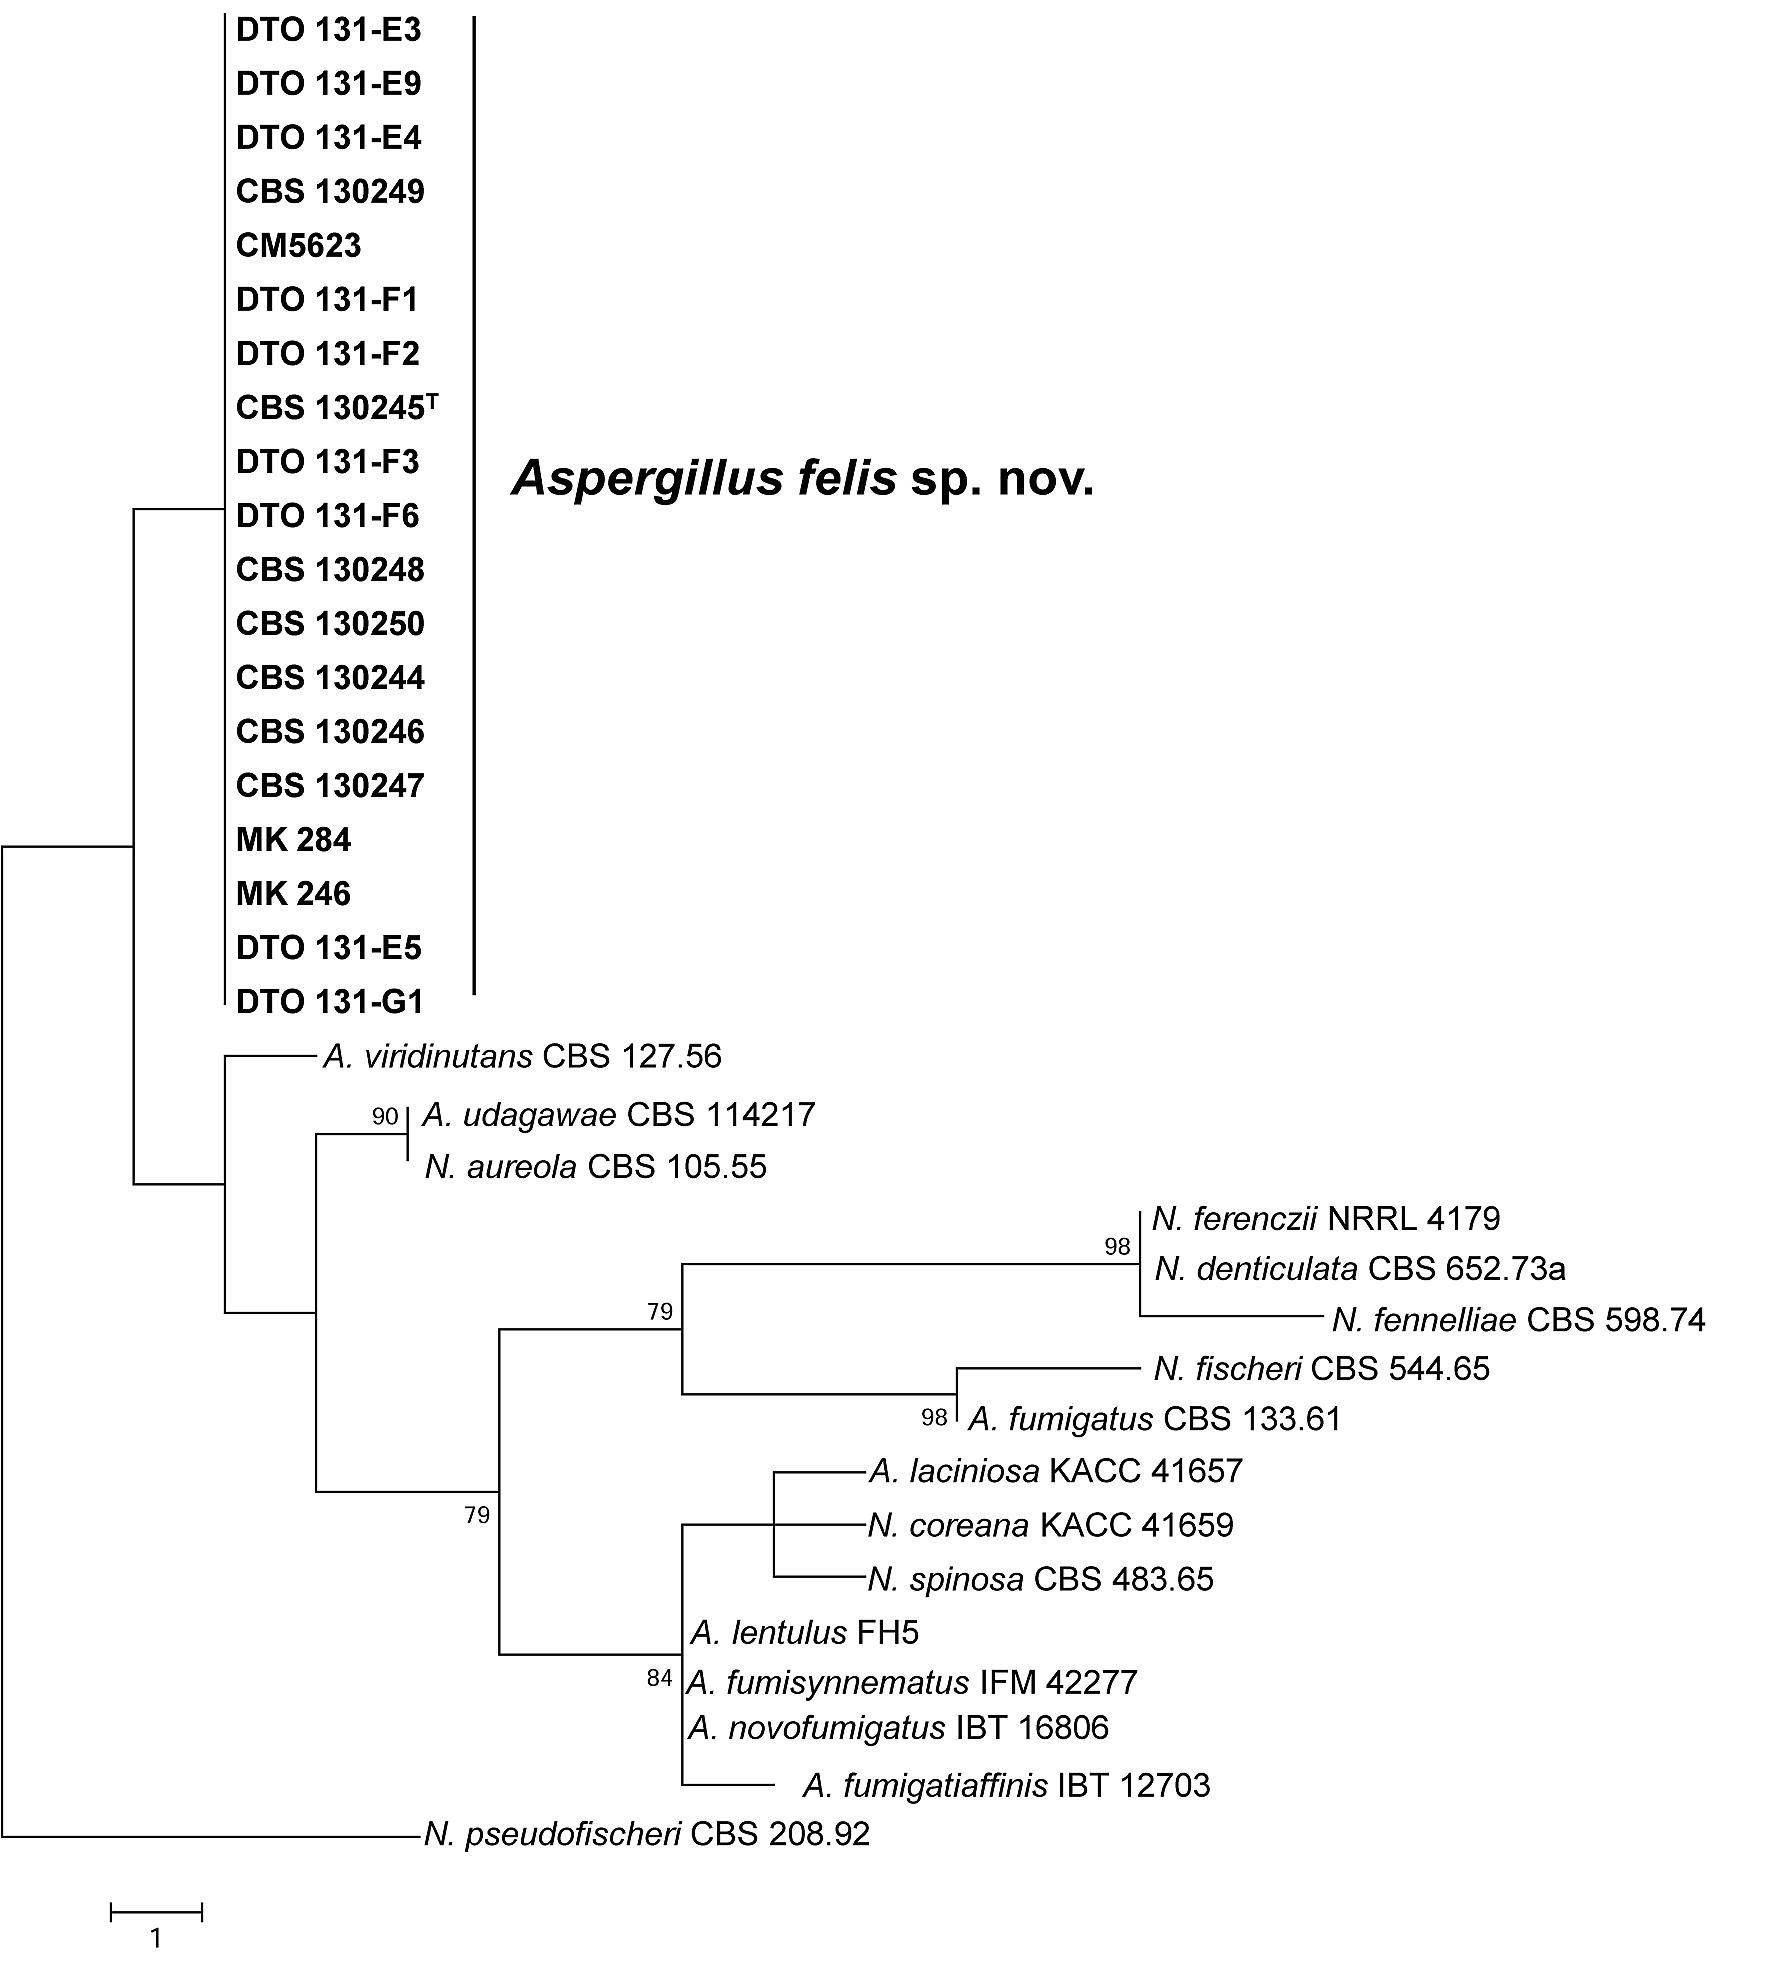 aspergillus felis sp nov an emerging agent of invasive